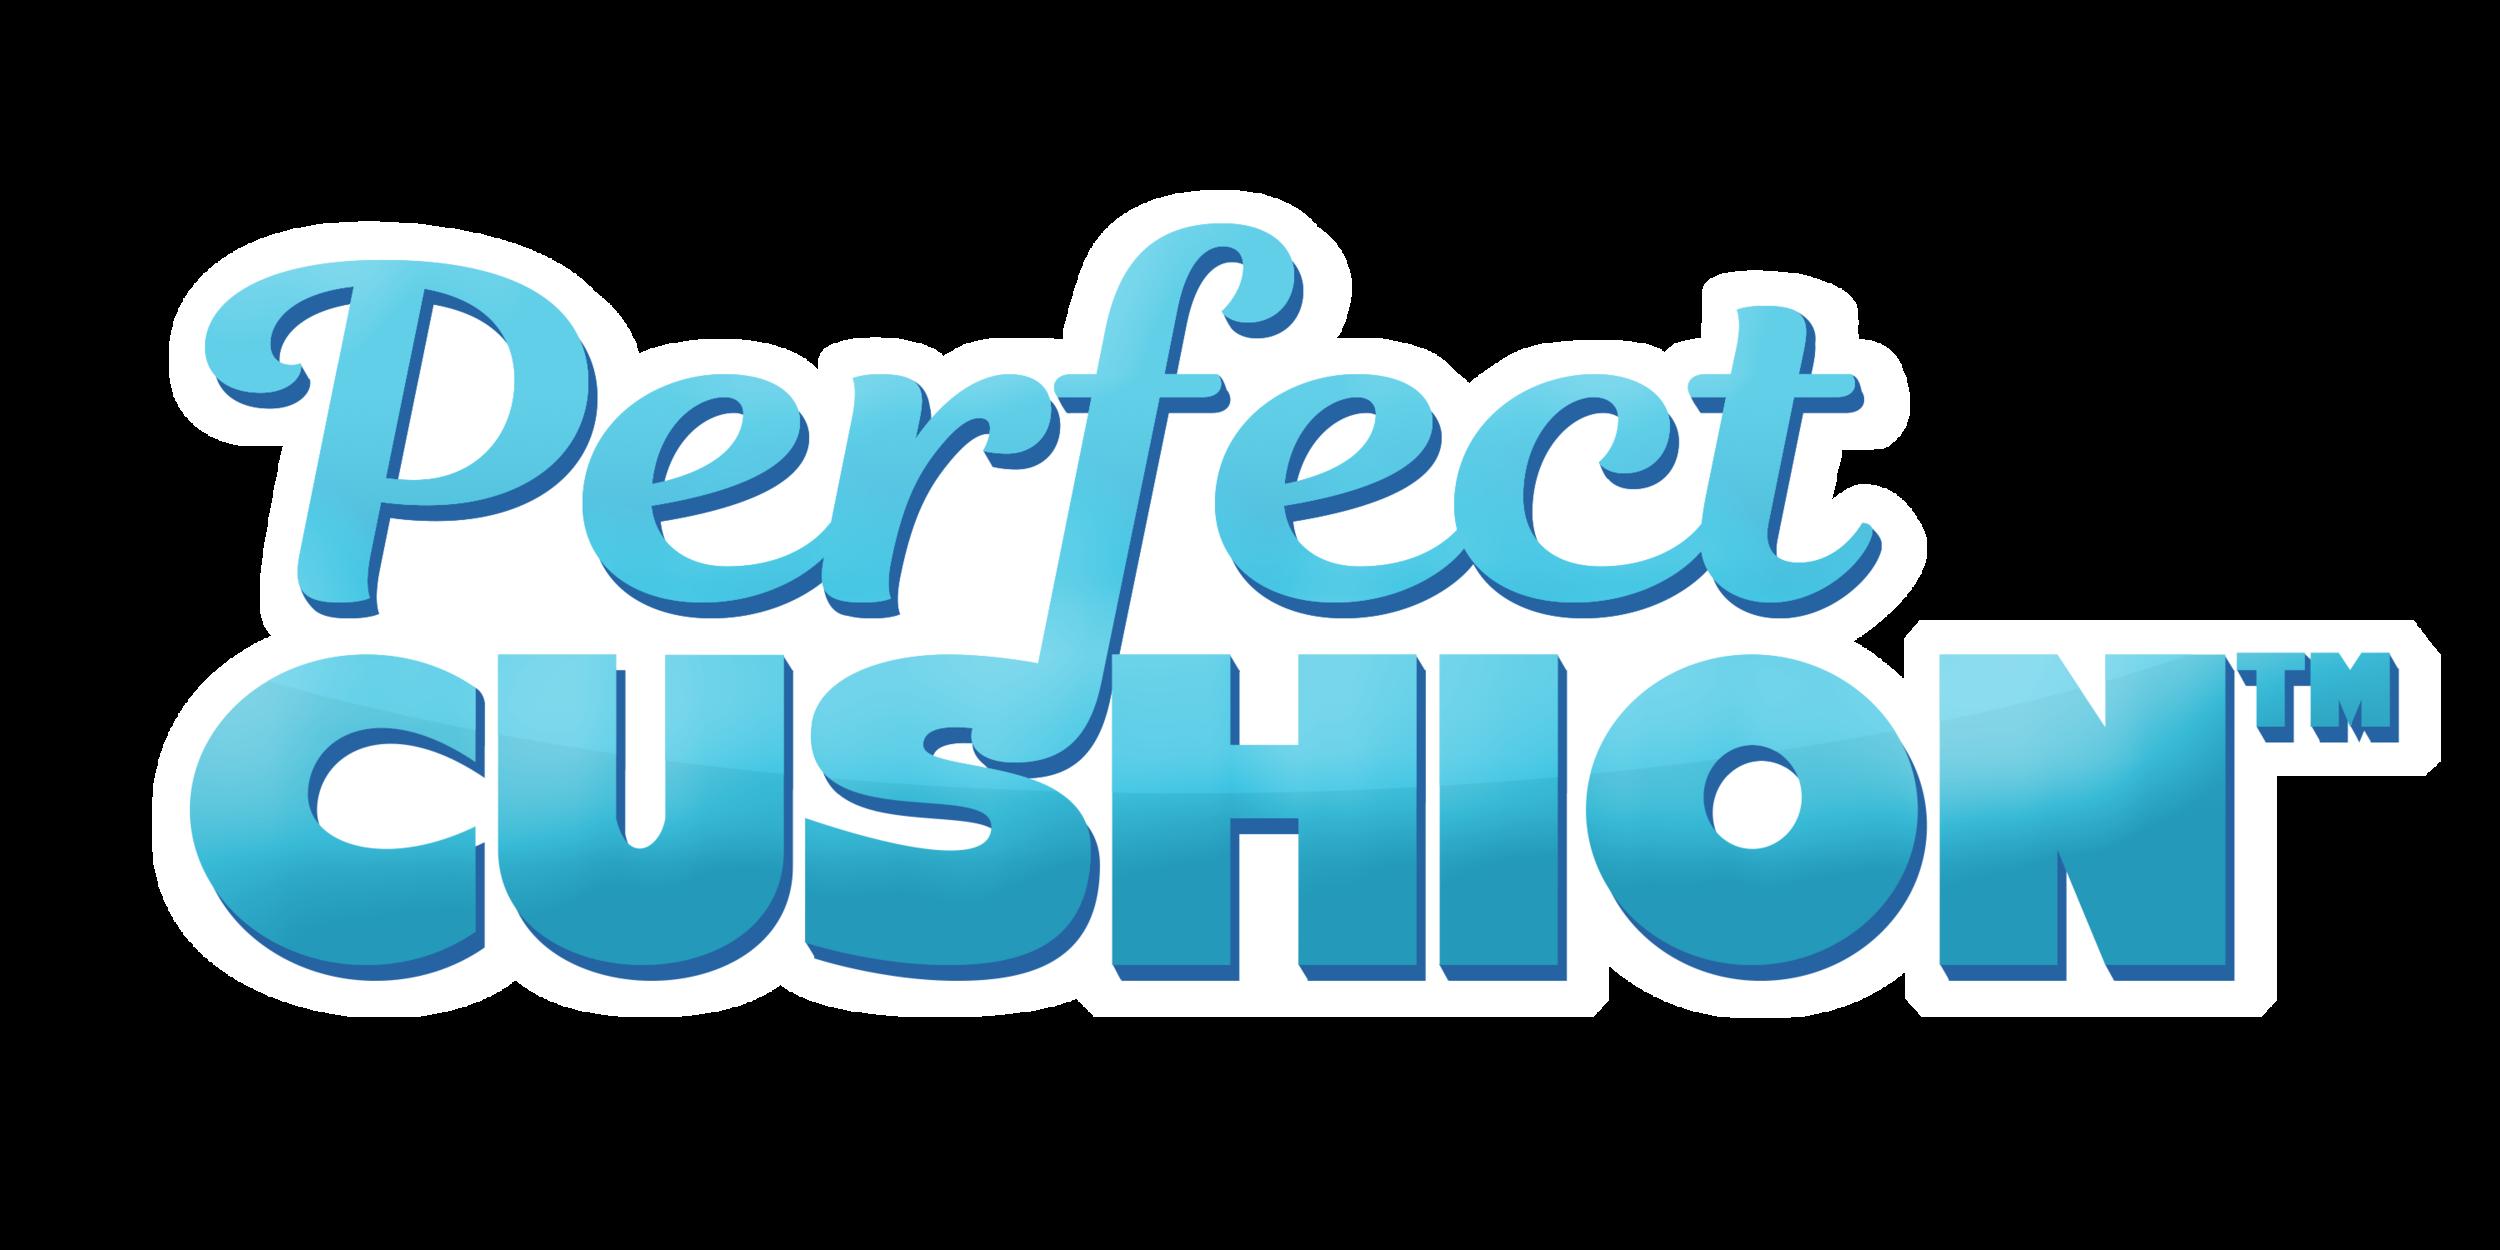 perfectcushion_logo_highres.png